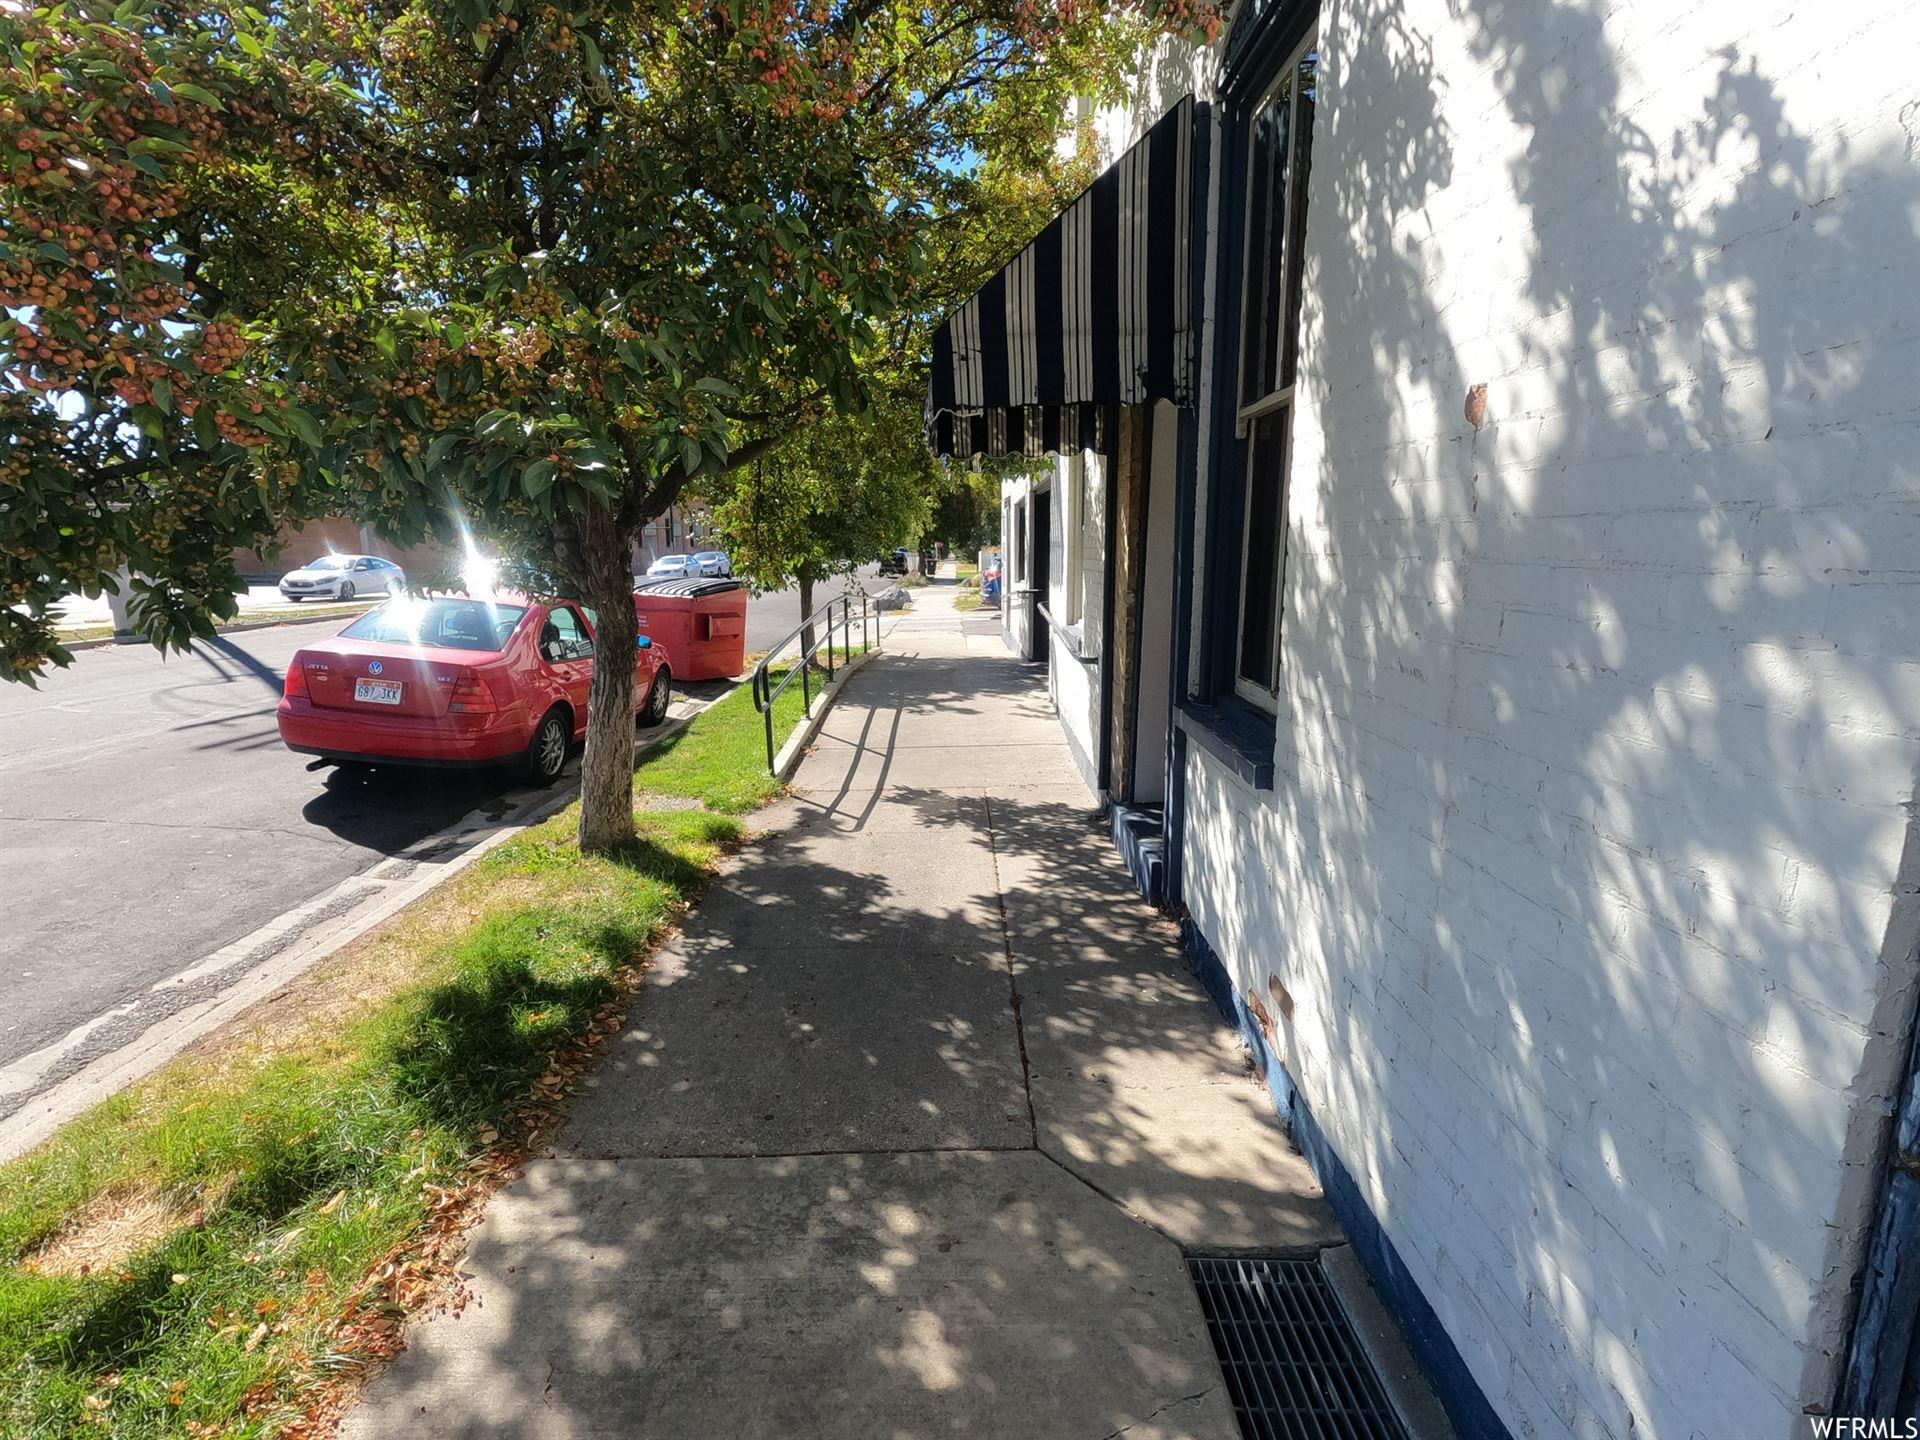 Photo of 296 S MAIN ST, Springville, UT 84663 (MLS # 1771284)